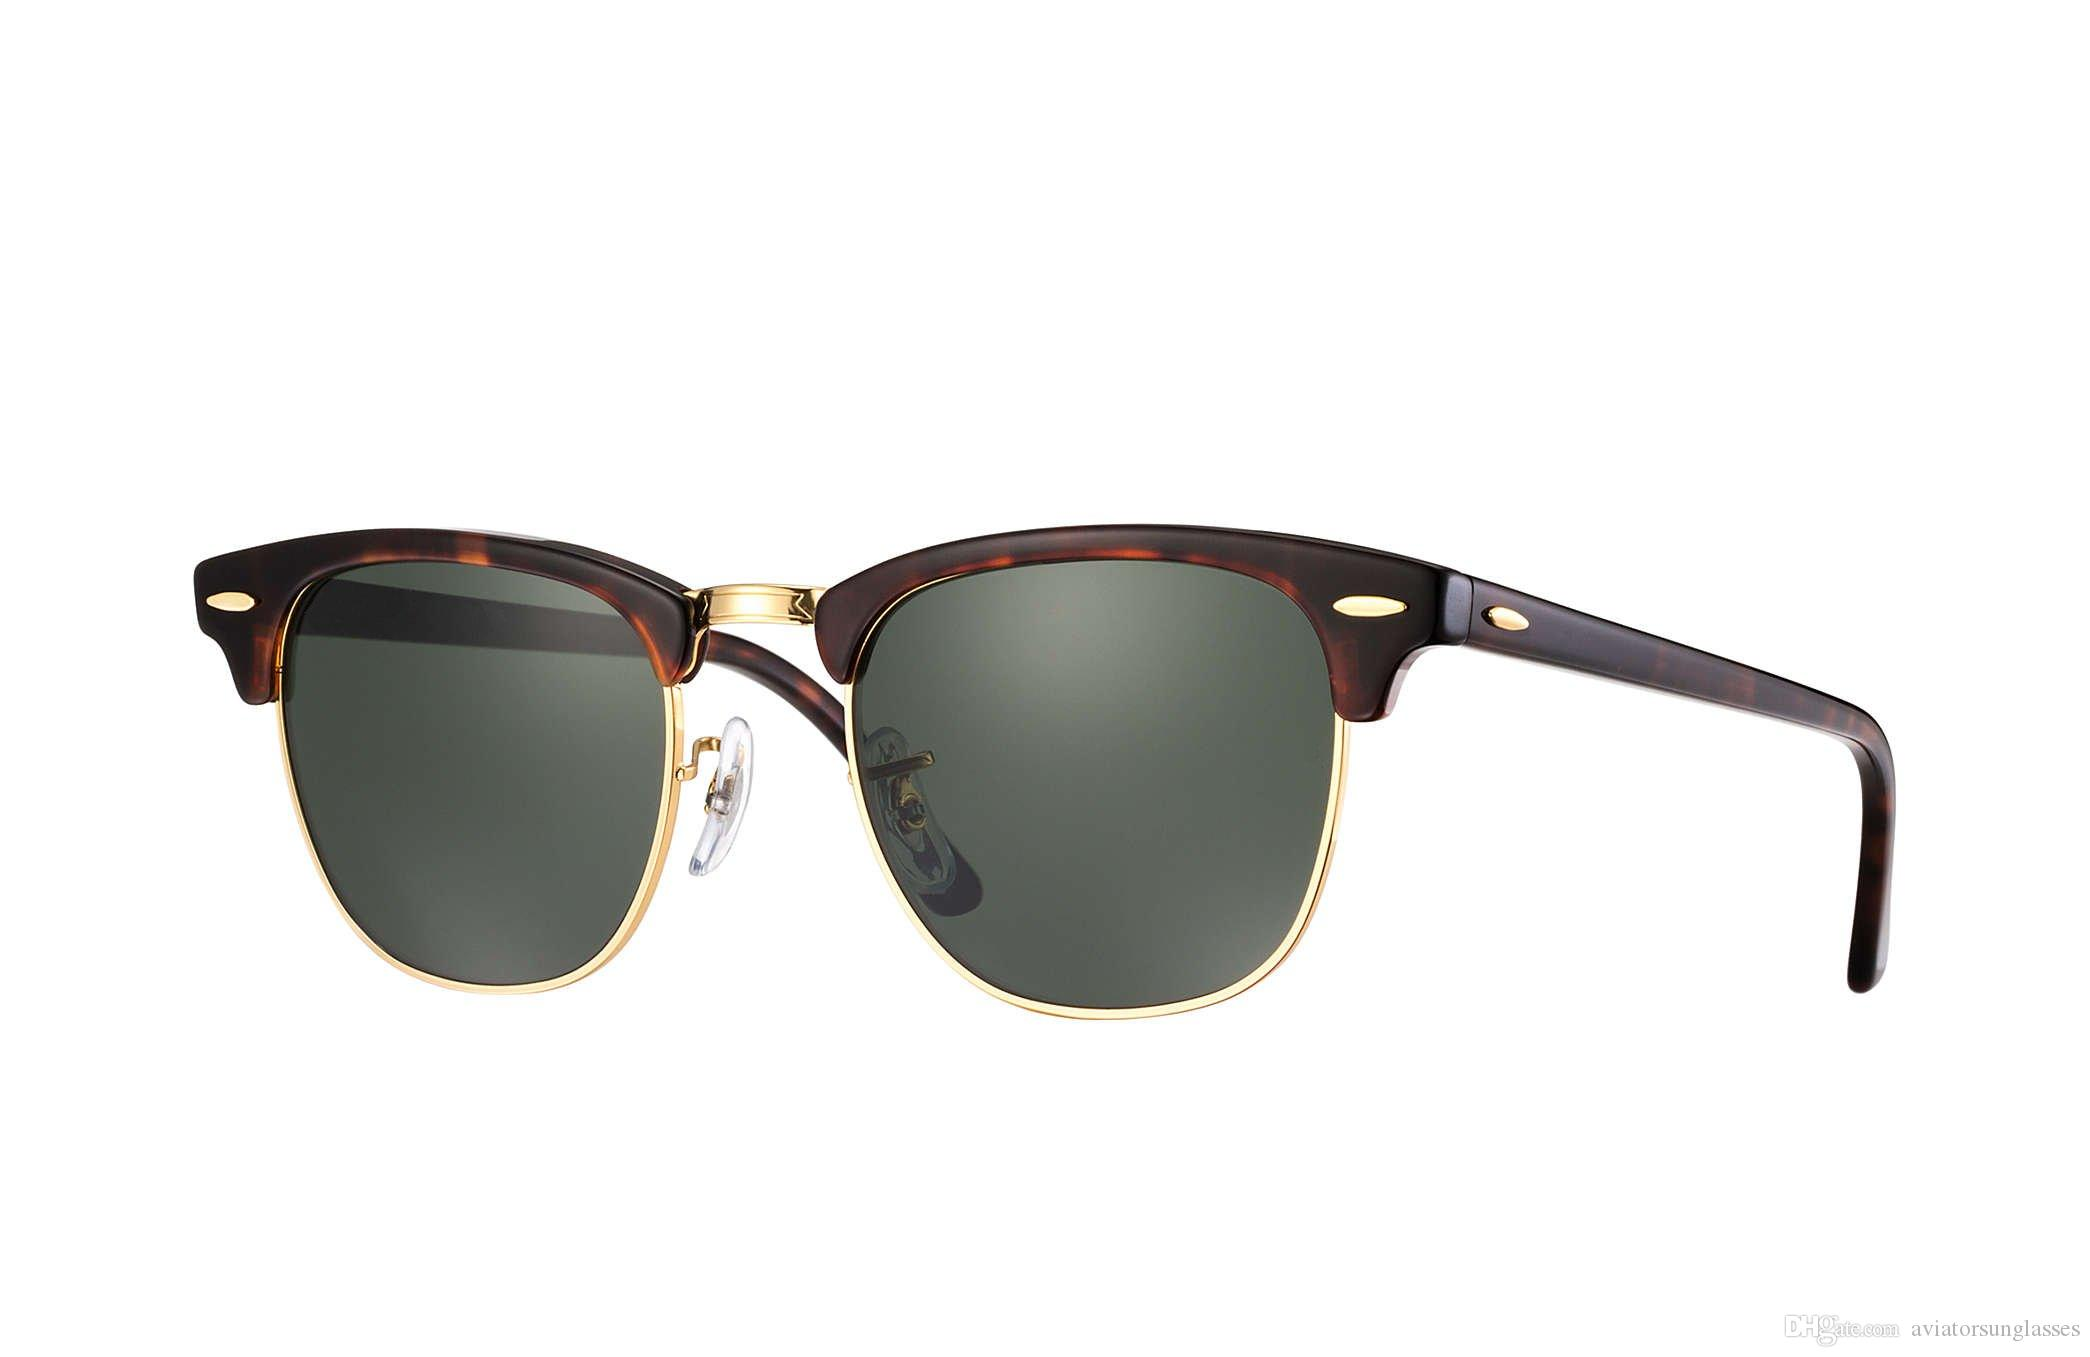 2018 Square Sunglasses 3016 Club Tortoise Frame 100% Uv Protection ...